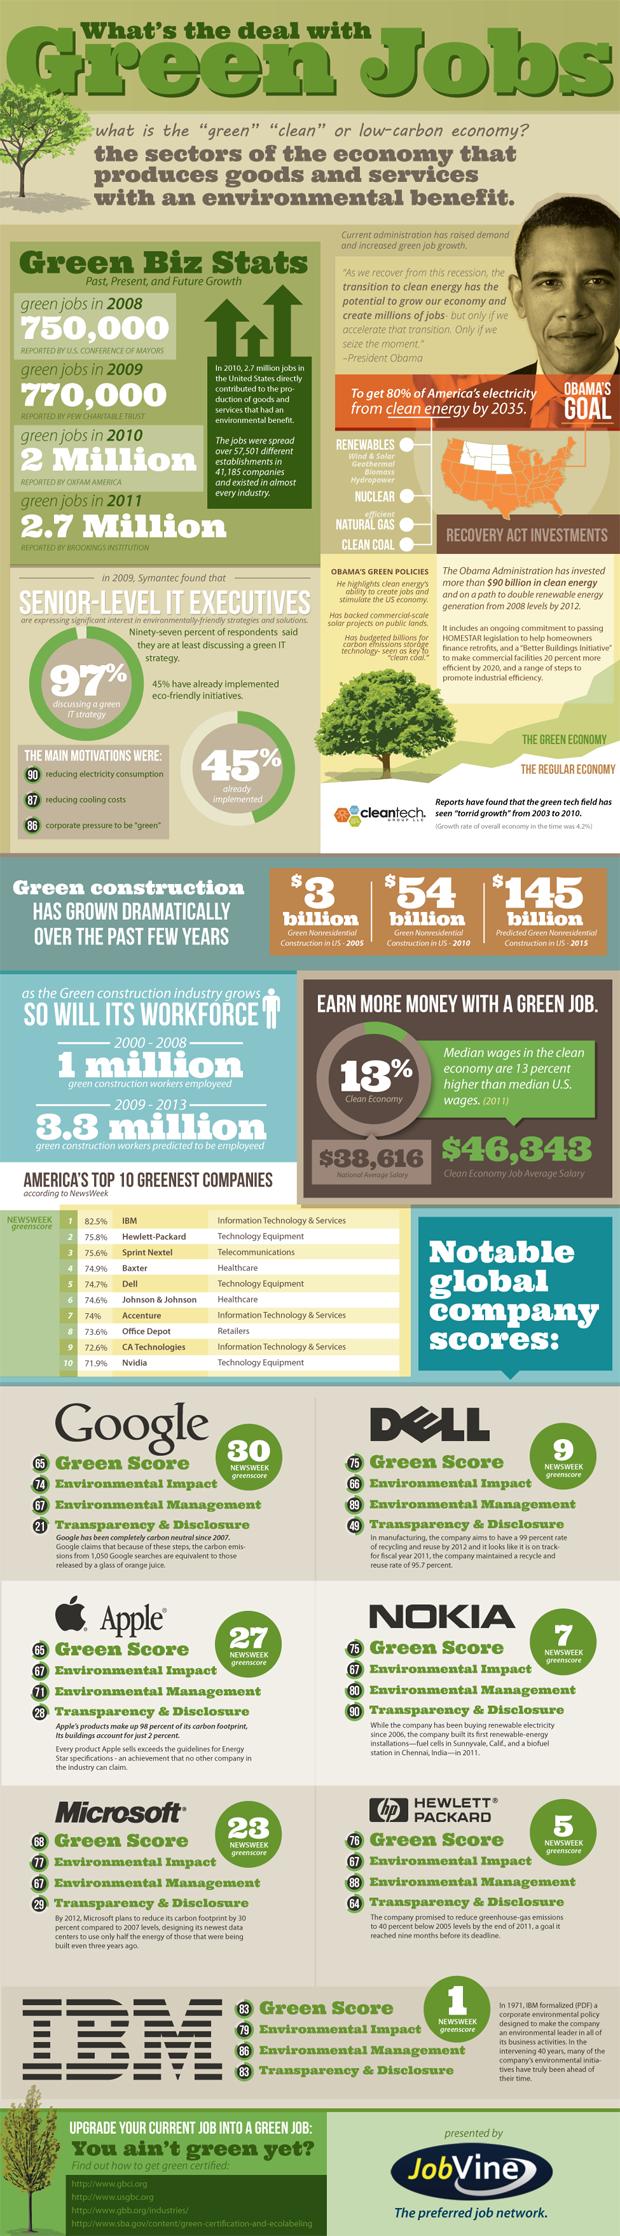 Going Green Job Market Statistics